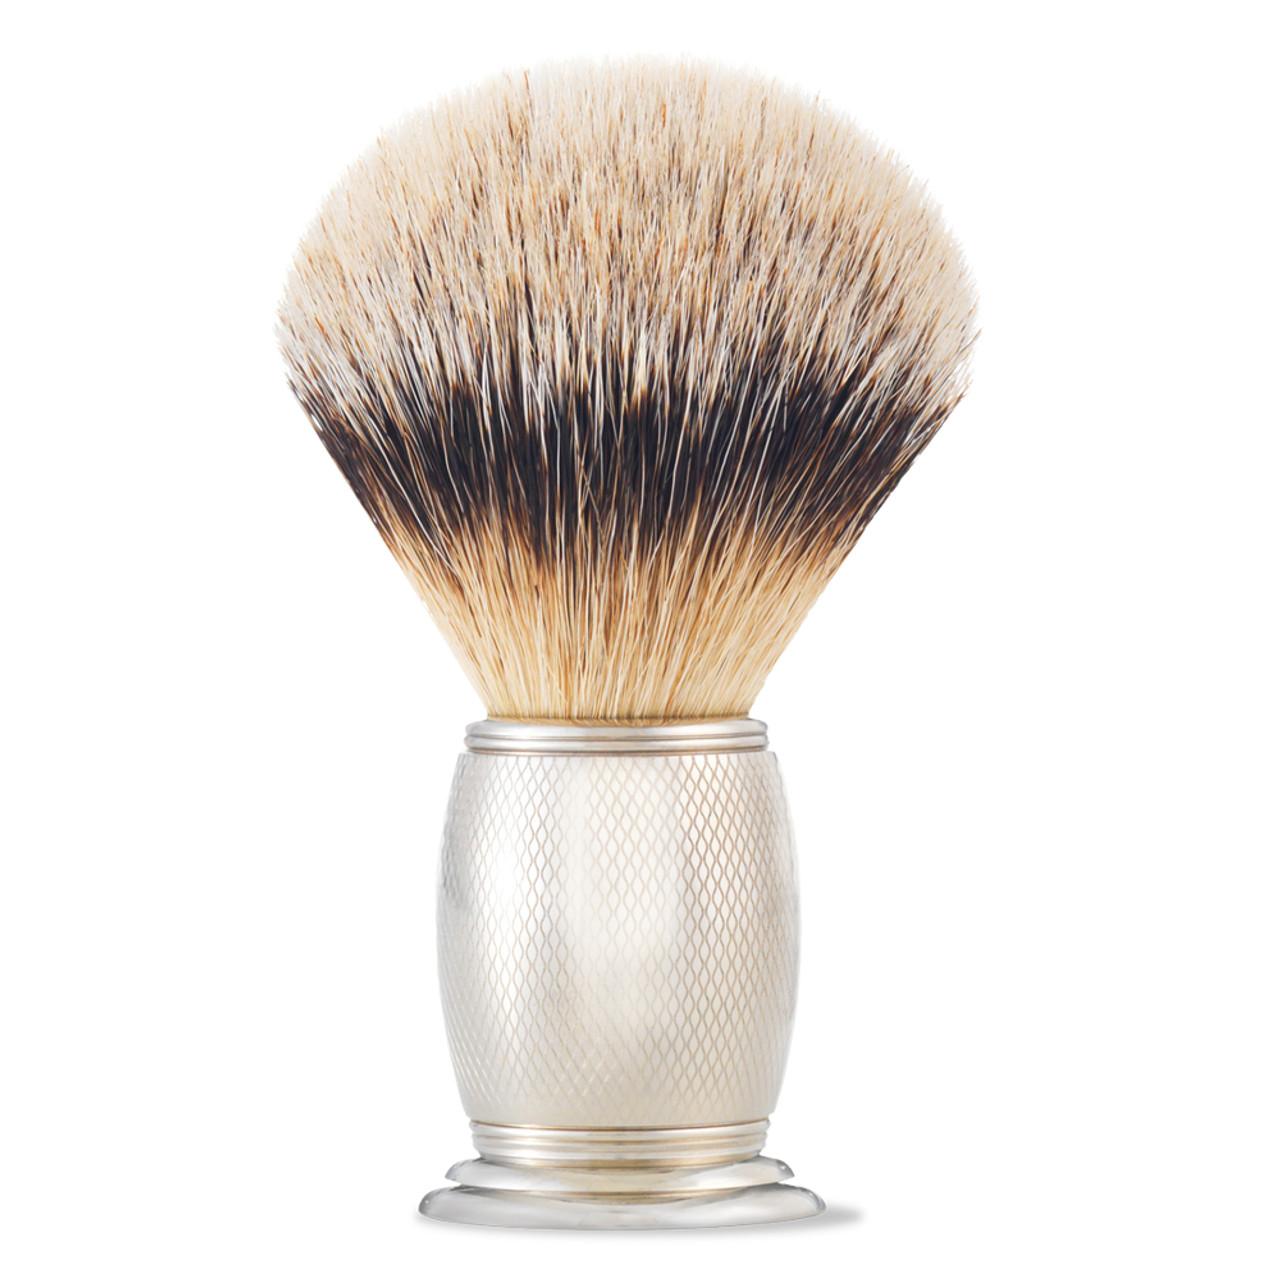 The Art of Shaving Brush Engraved Nickel S-Tip Brush BeautifiedYou.com